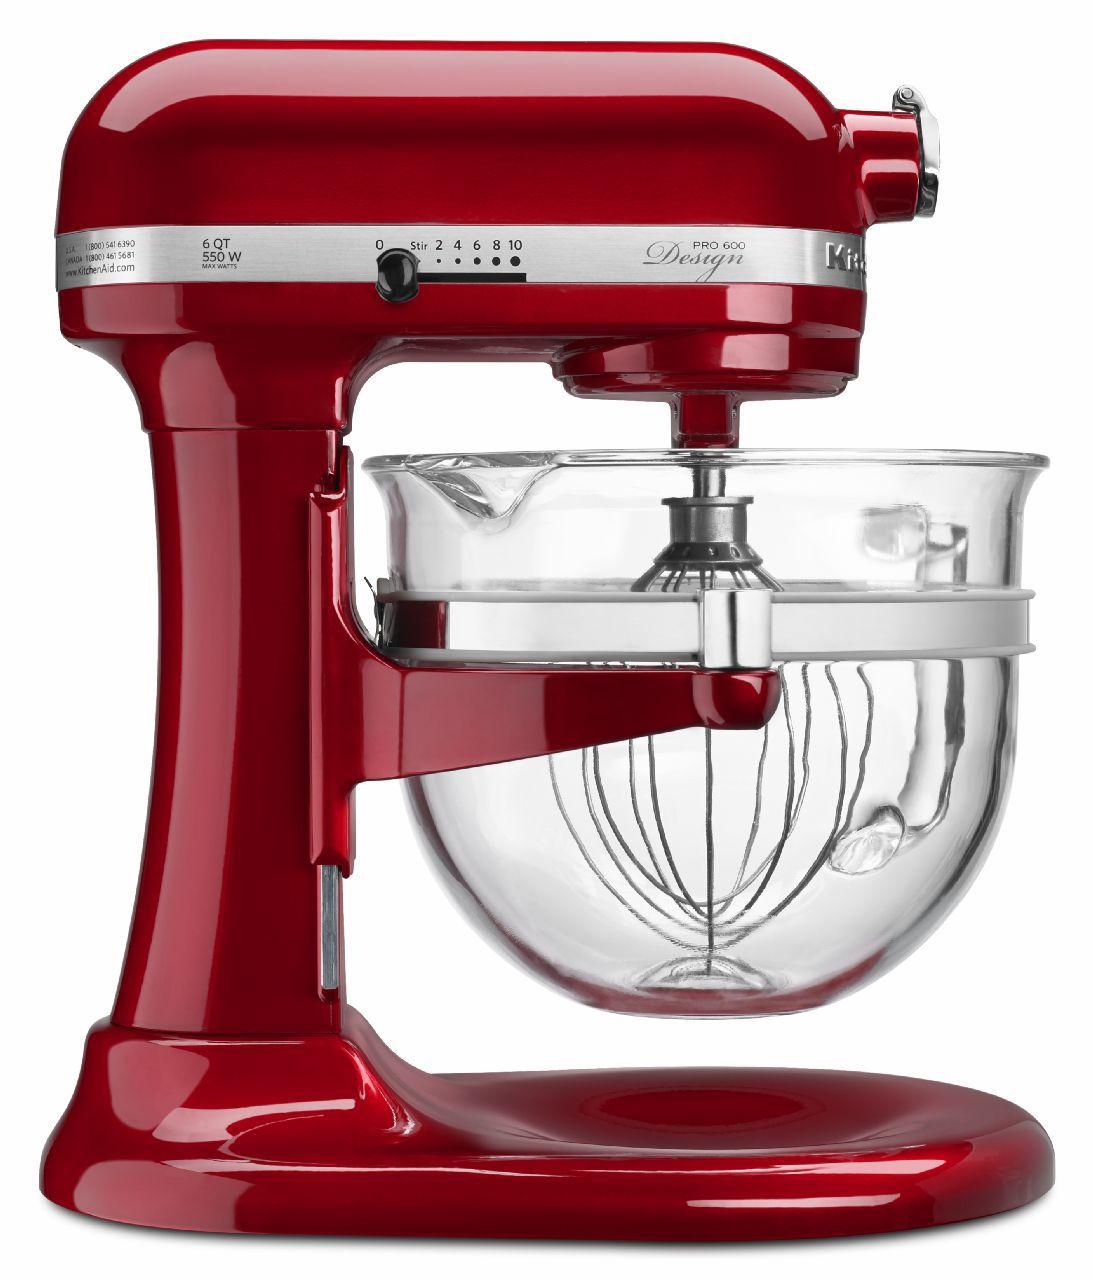 KitchenAid Professional 600 Series 6 Quart Candy Apple Red Bowl-Lift Stand  Mixer